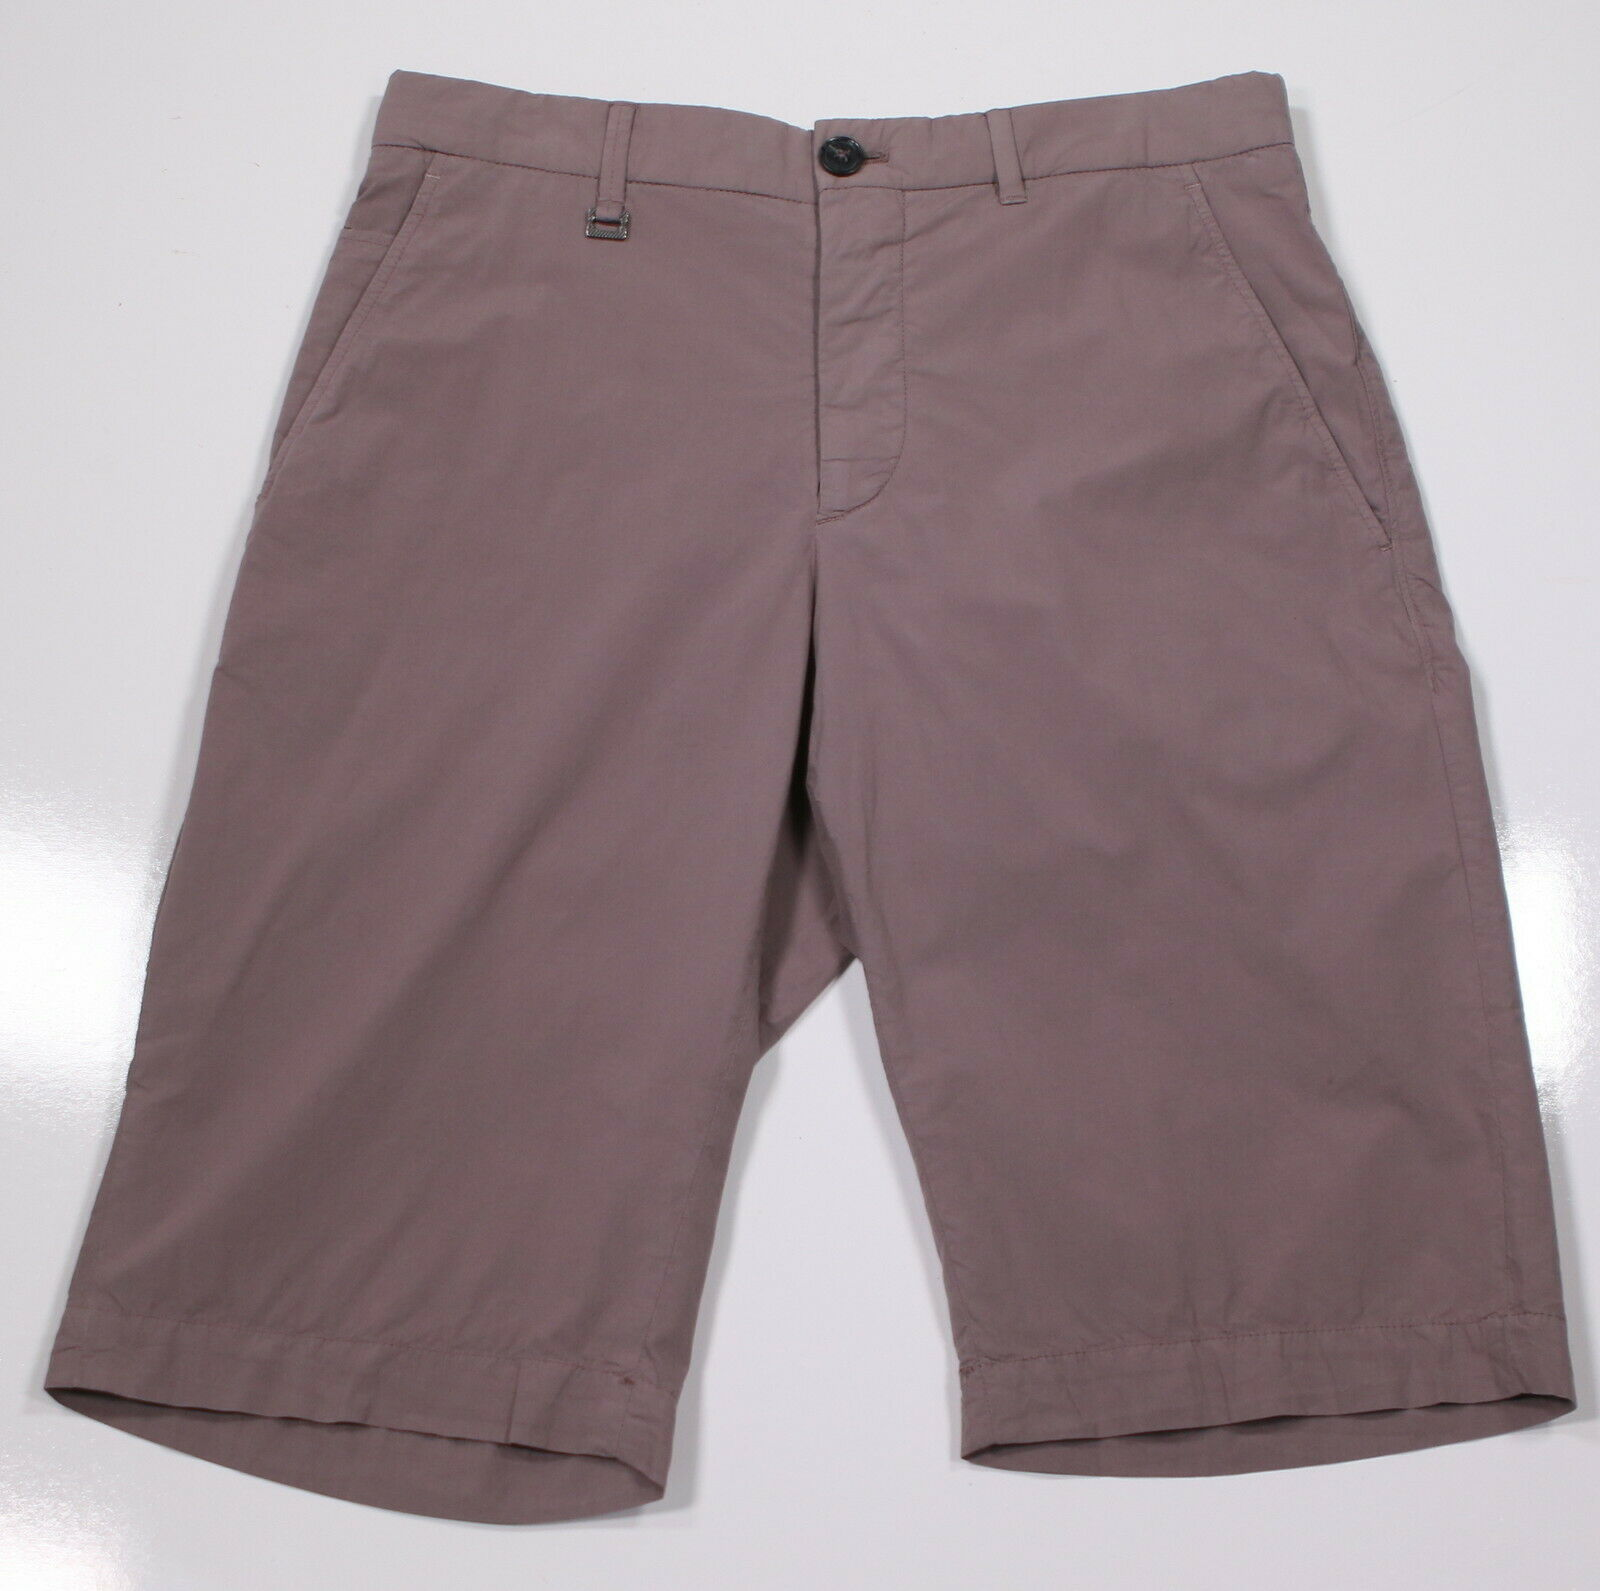 ERMENEGILDO ZEGNA  Recent Cotton Stretch Flat Front Shorts 28